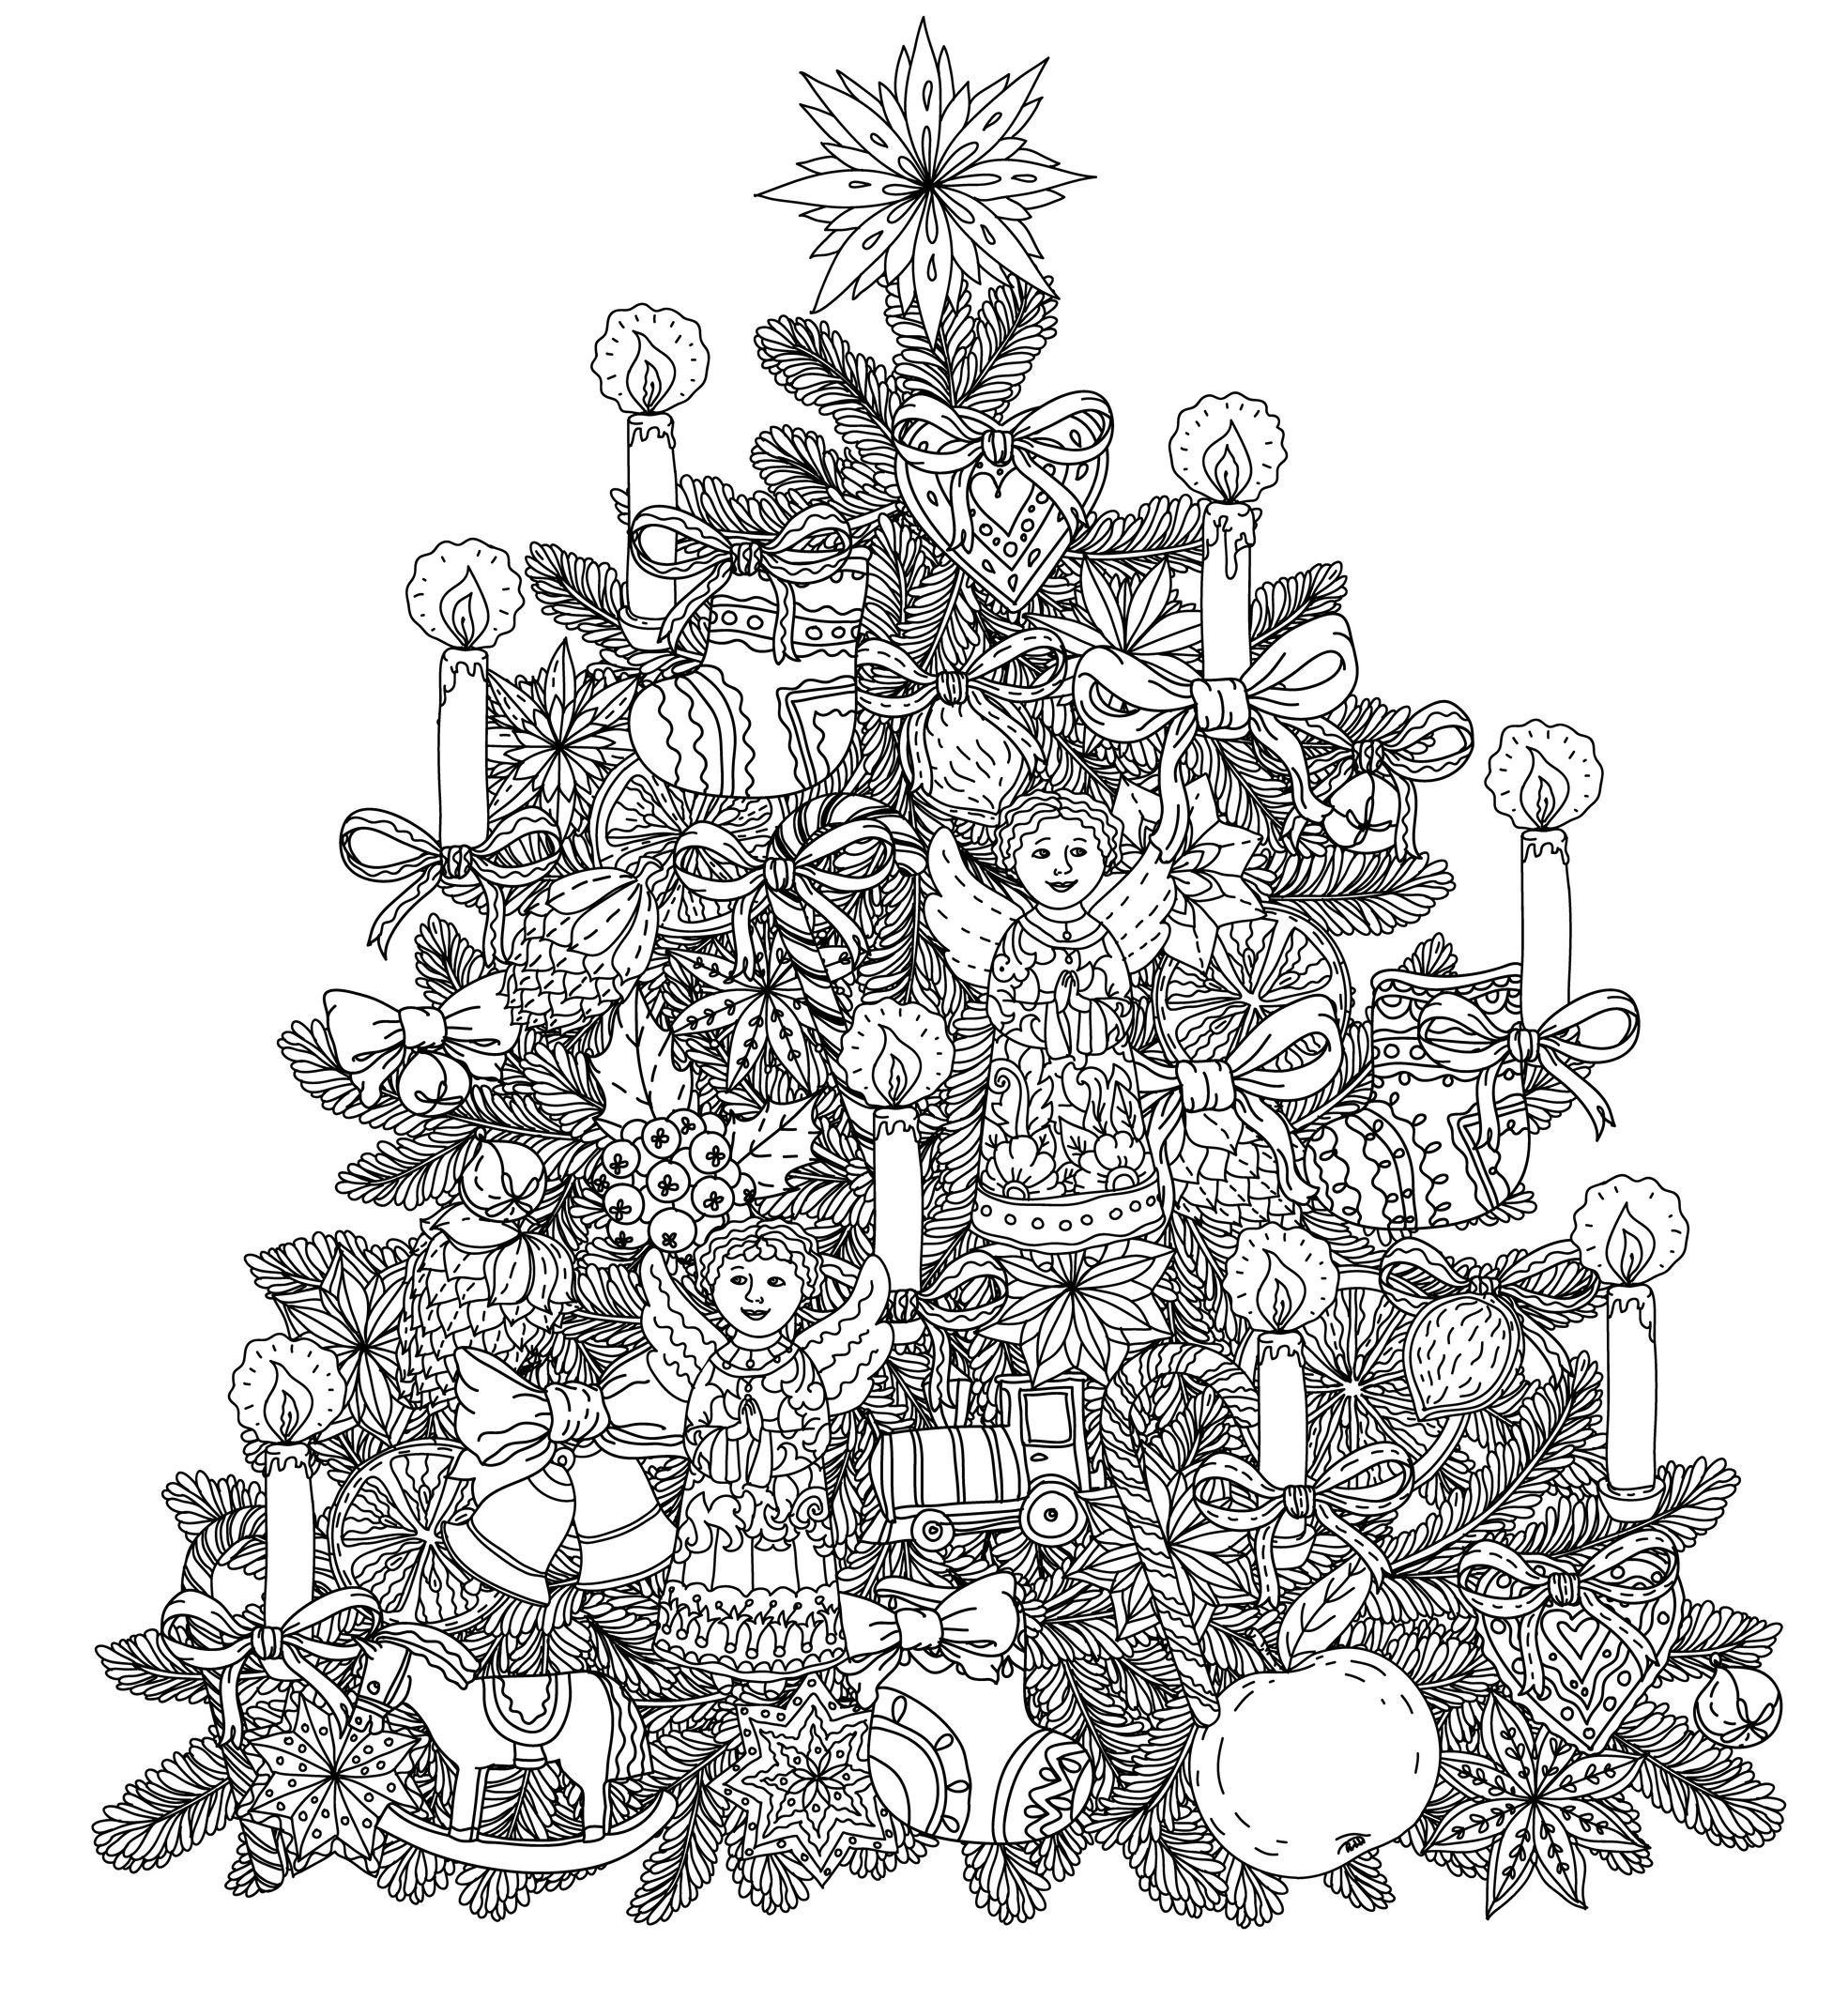 Christmas Tree With Ornaments - Christmas Adult Coloring Pages - Free Printable Christmas Tree Ornaments Coloring Pages